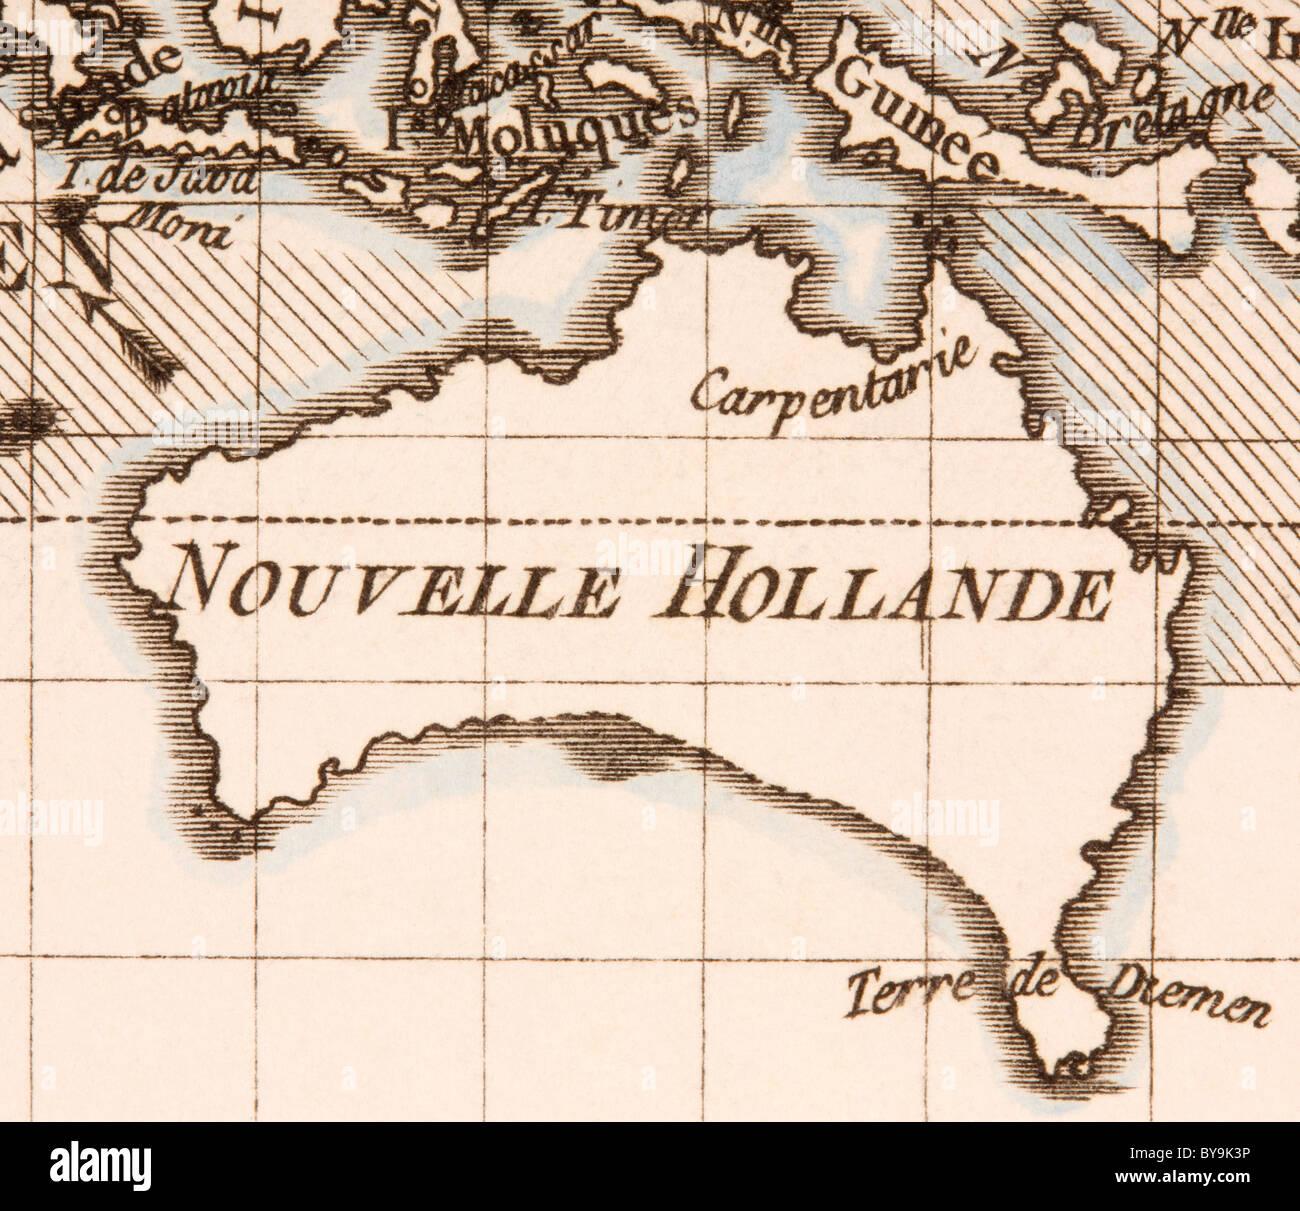 Australia circa 1760. Mercator projection. - Stock Image